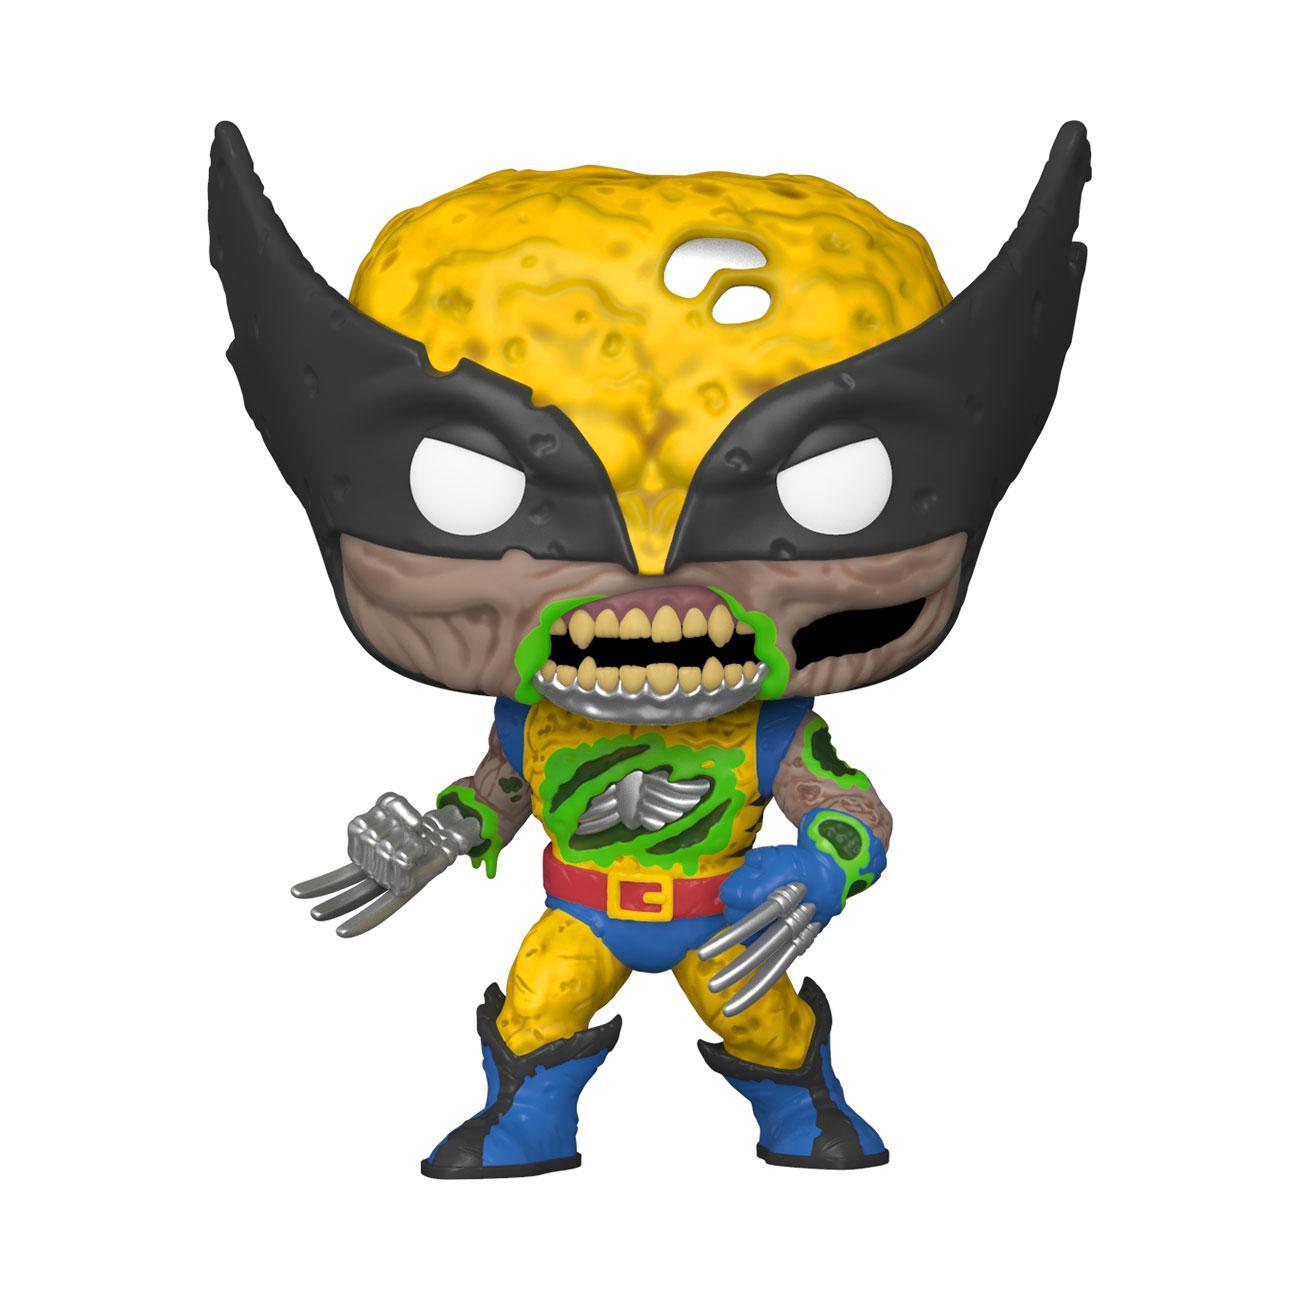 Marvel POP! Vinyl Figure Zombie Wolverine 9 cm